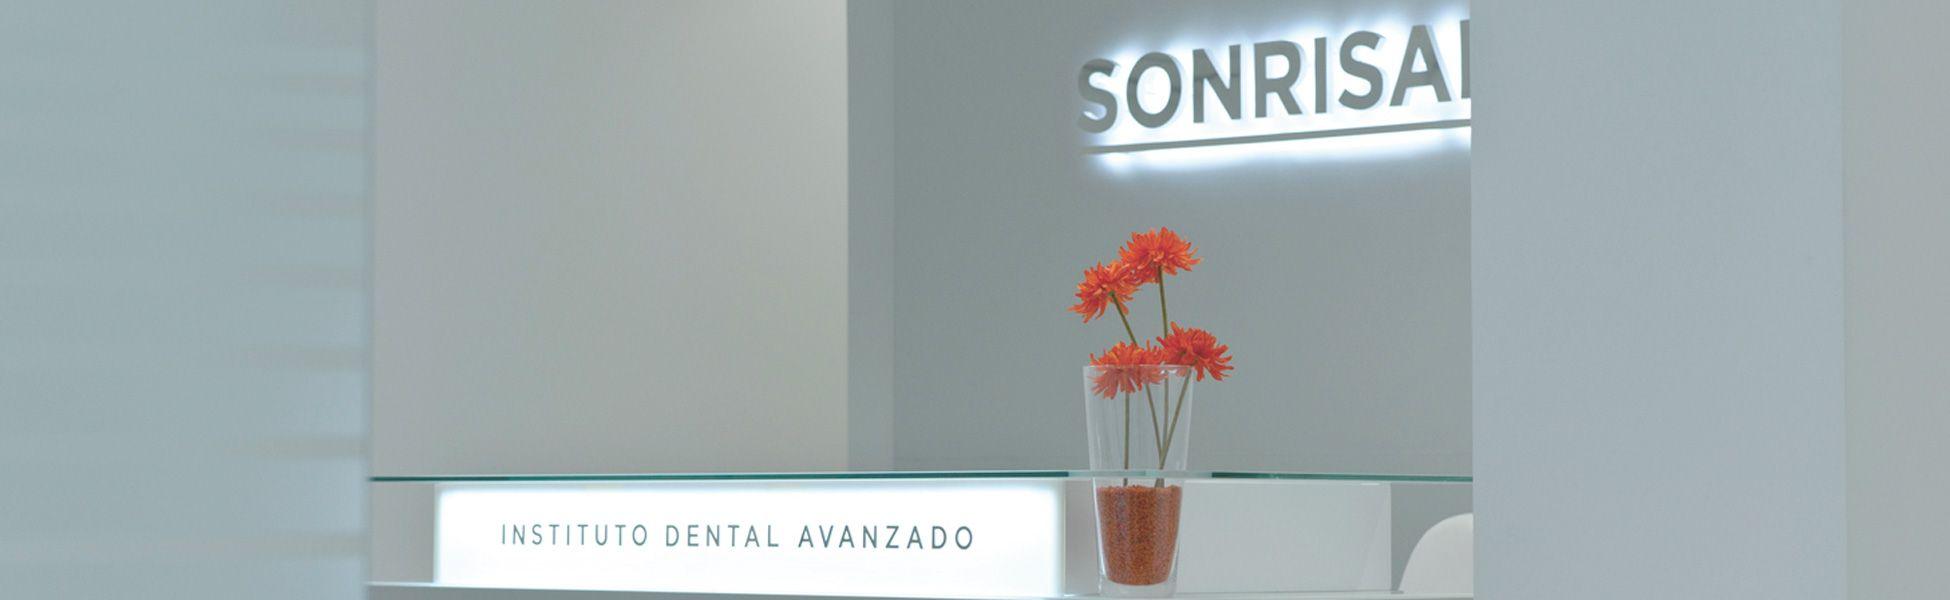 Clinica-sonrisalud-01